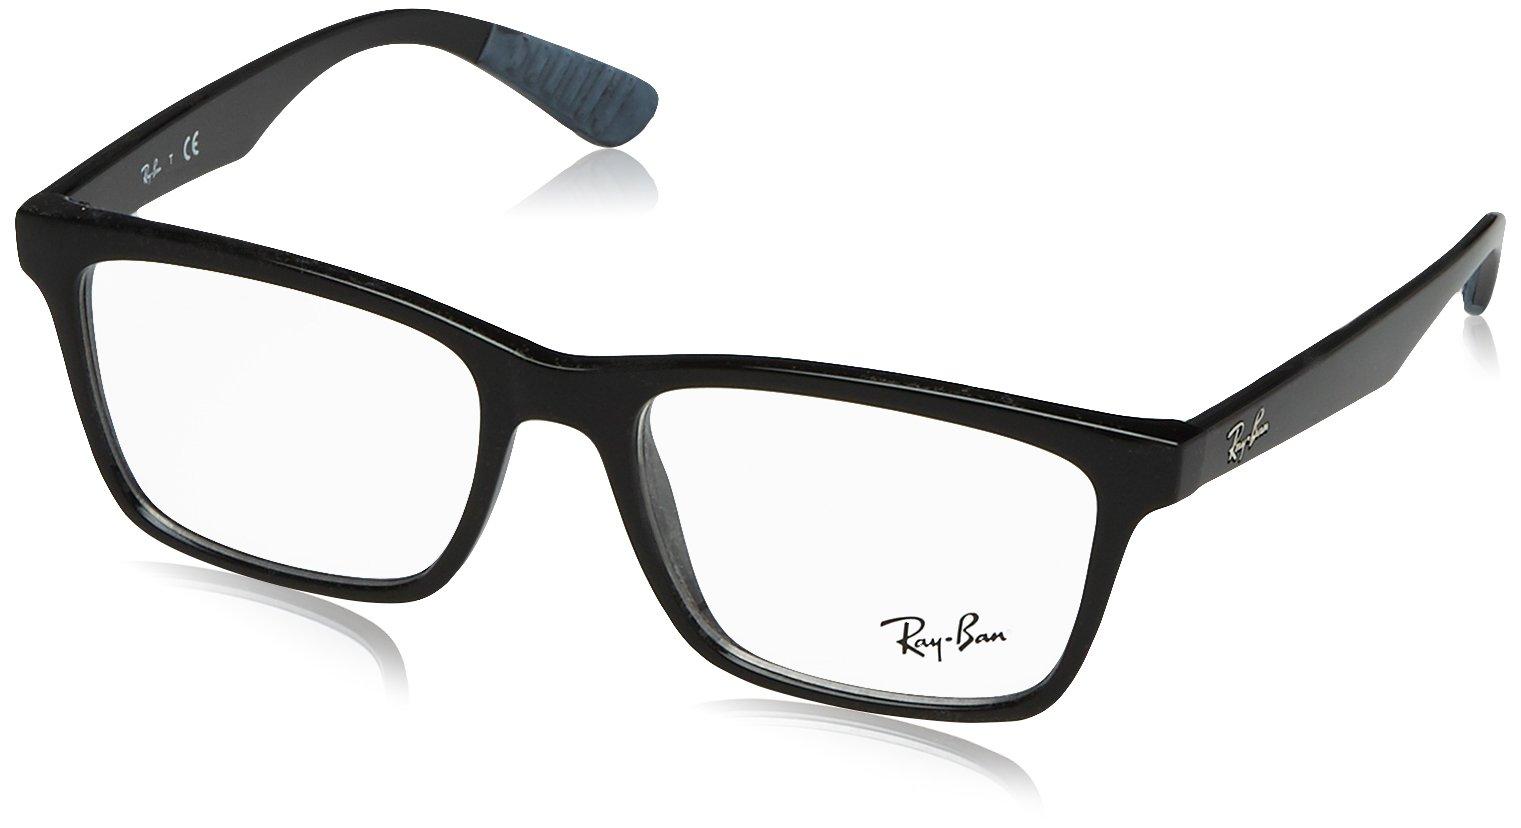 Ray-Ban RX7025 Square Eyeglass Frames, Shiny Black/Demo Lens, 55 mm by Ray-Ban